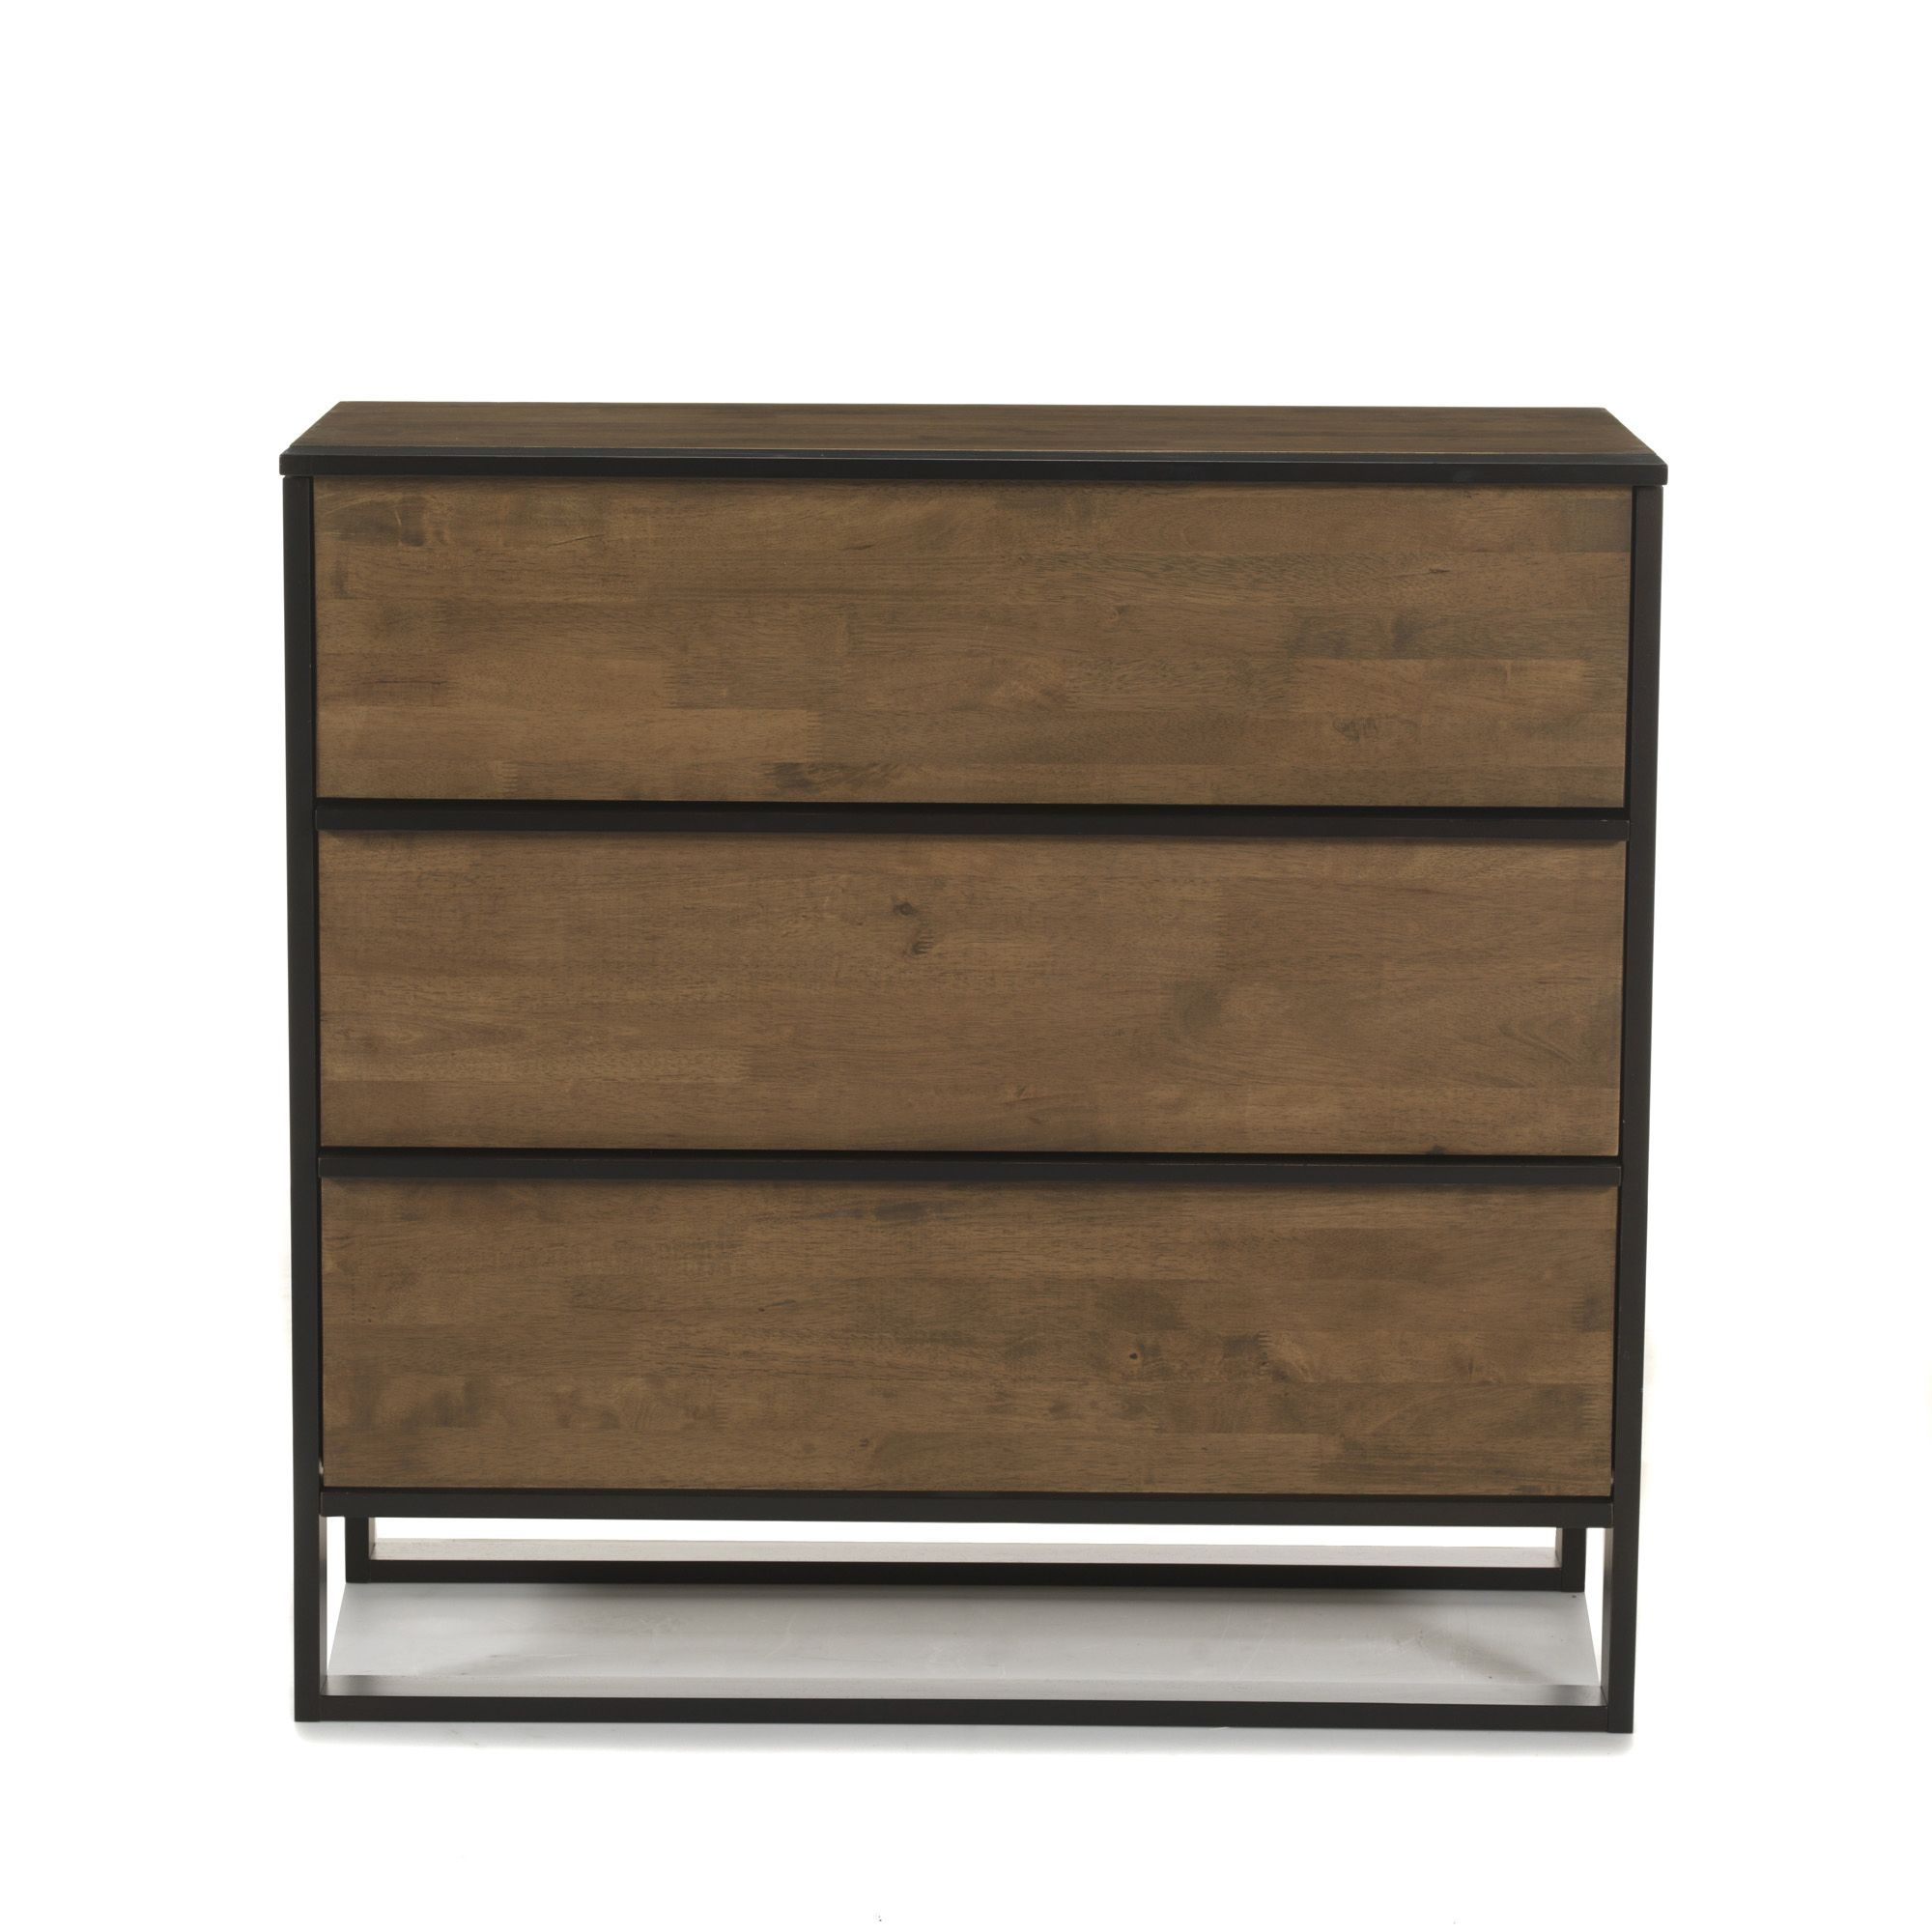 310db44f30add954c22b1d0f824d1bce Incroyable De Table Basse Ikea Avec Tiroir Concept